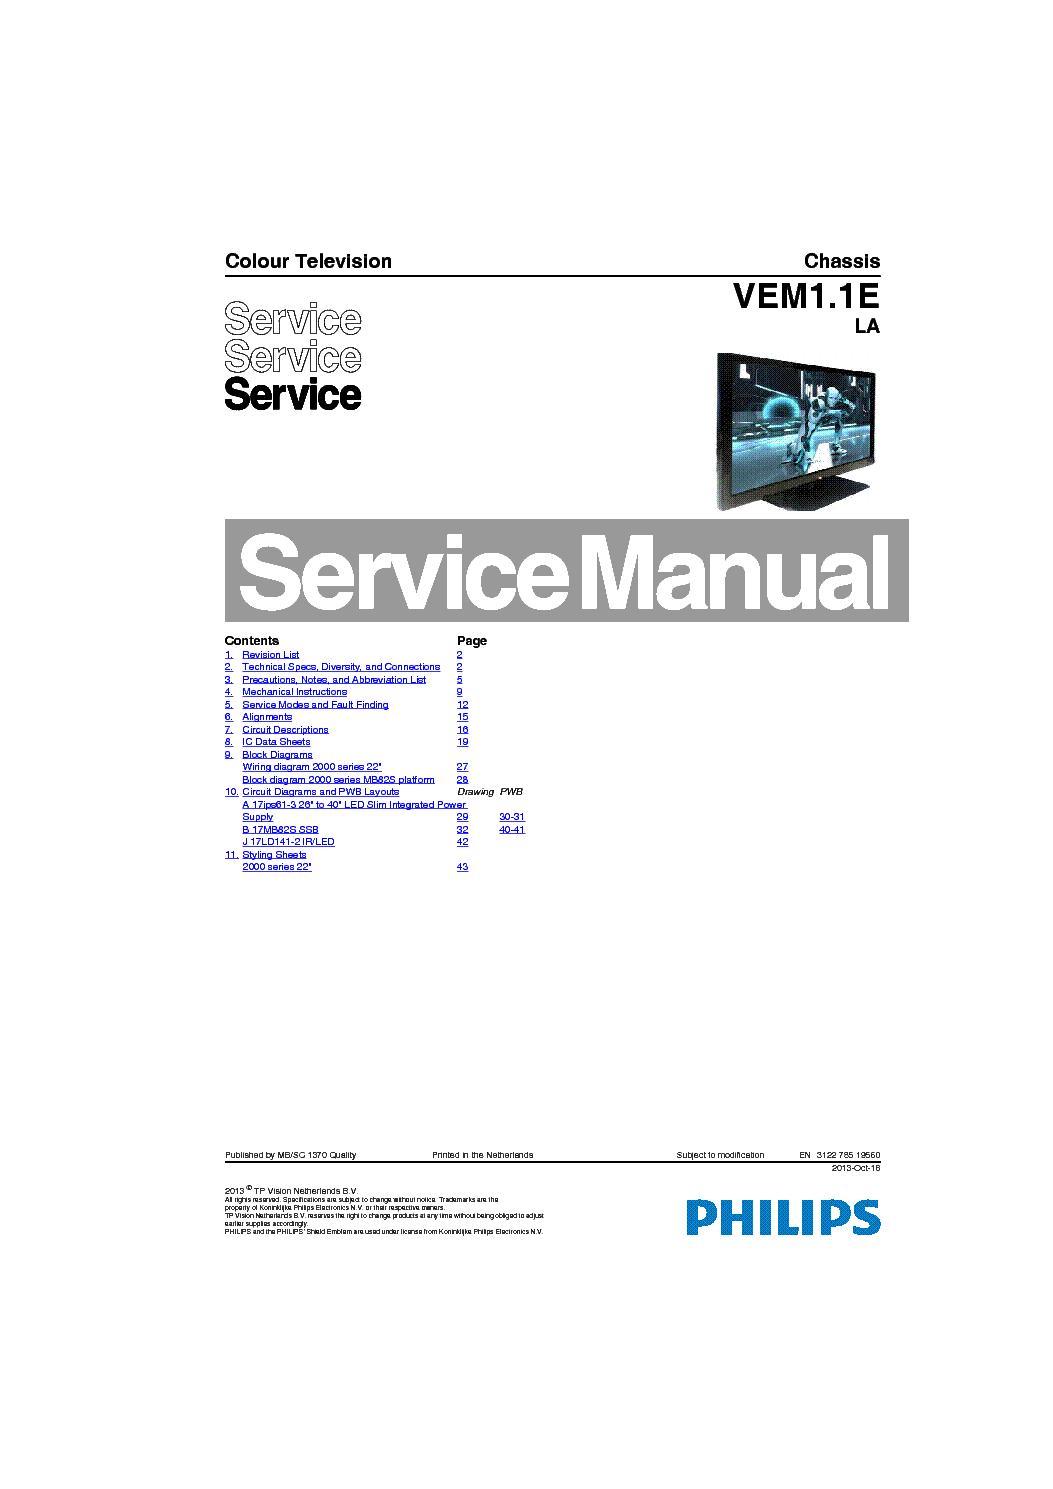 PHILIPS 28PFL2908H-12 CHASSIS VEM1 1ELA 17MB82S Service